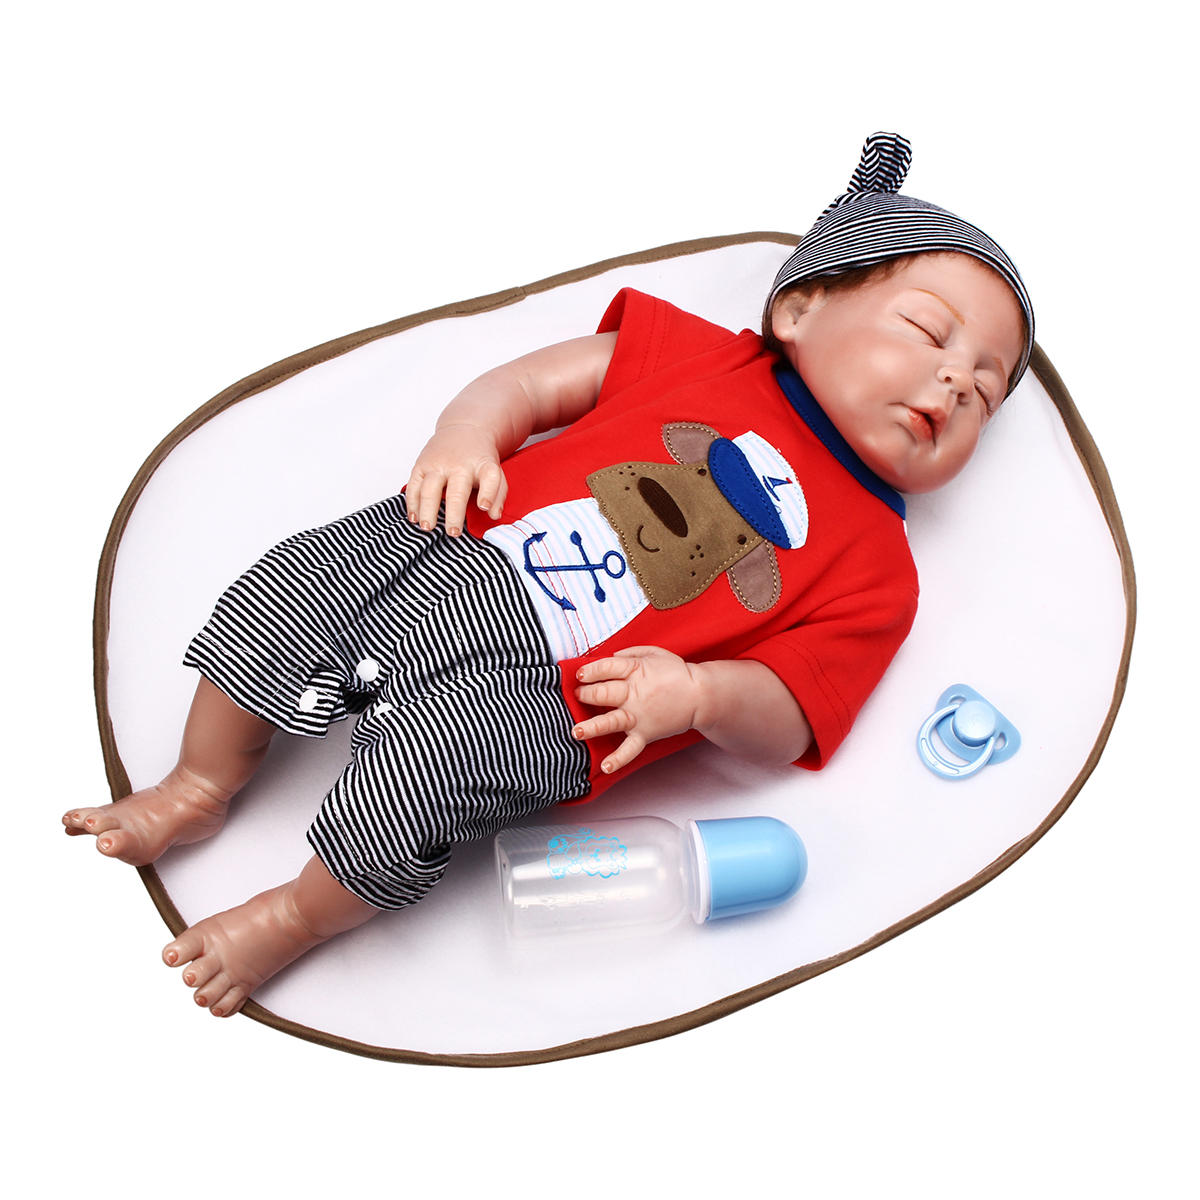 NPK 23 Inch 58cm Reborn Baby Sleeping Soft Silicone Doll Handmade Lifeike Baby Girl Dolls Play House Toys Birthday Gift